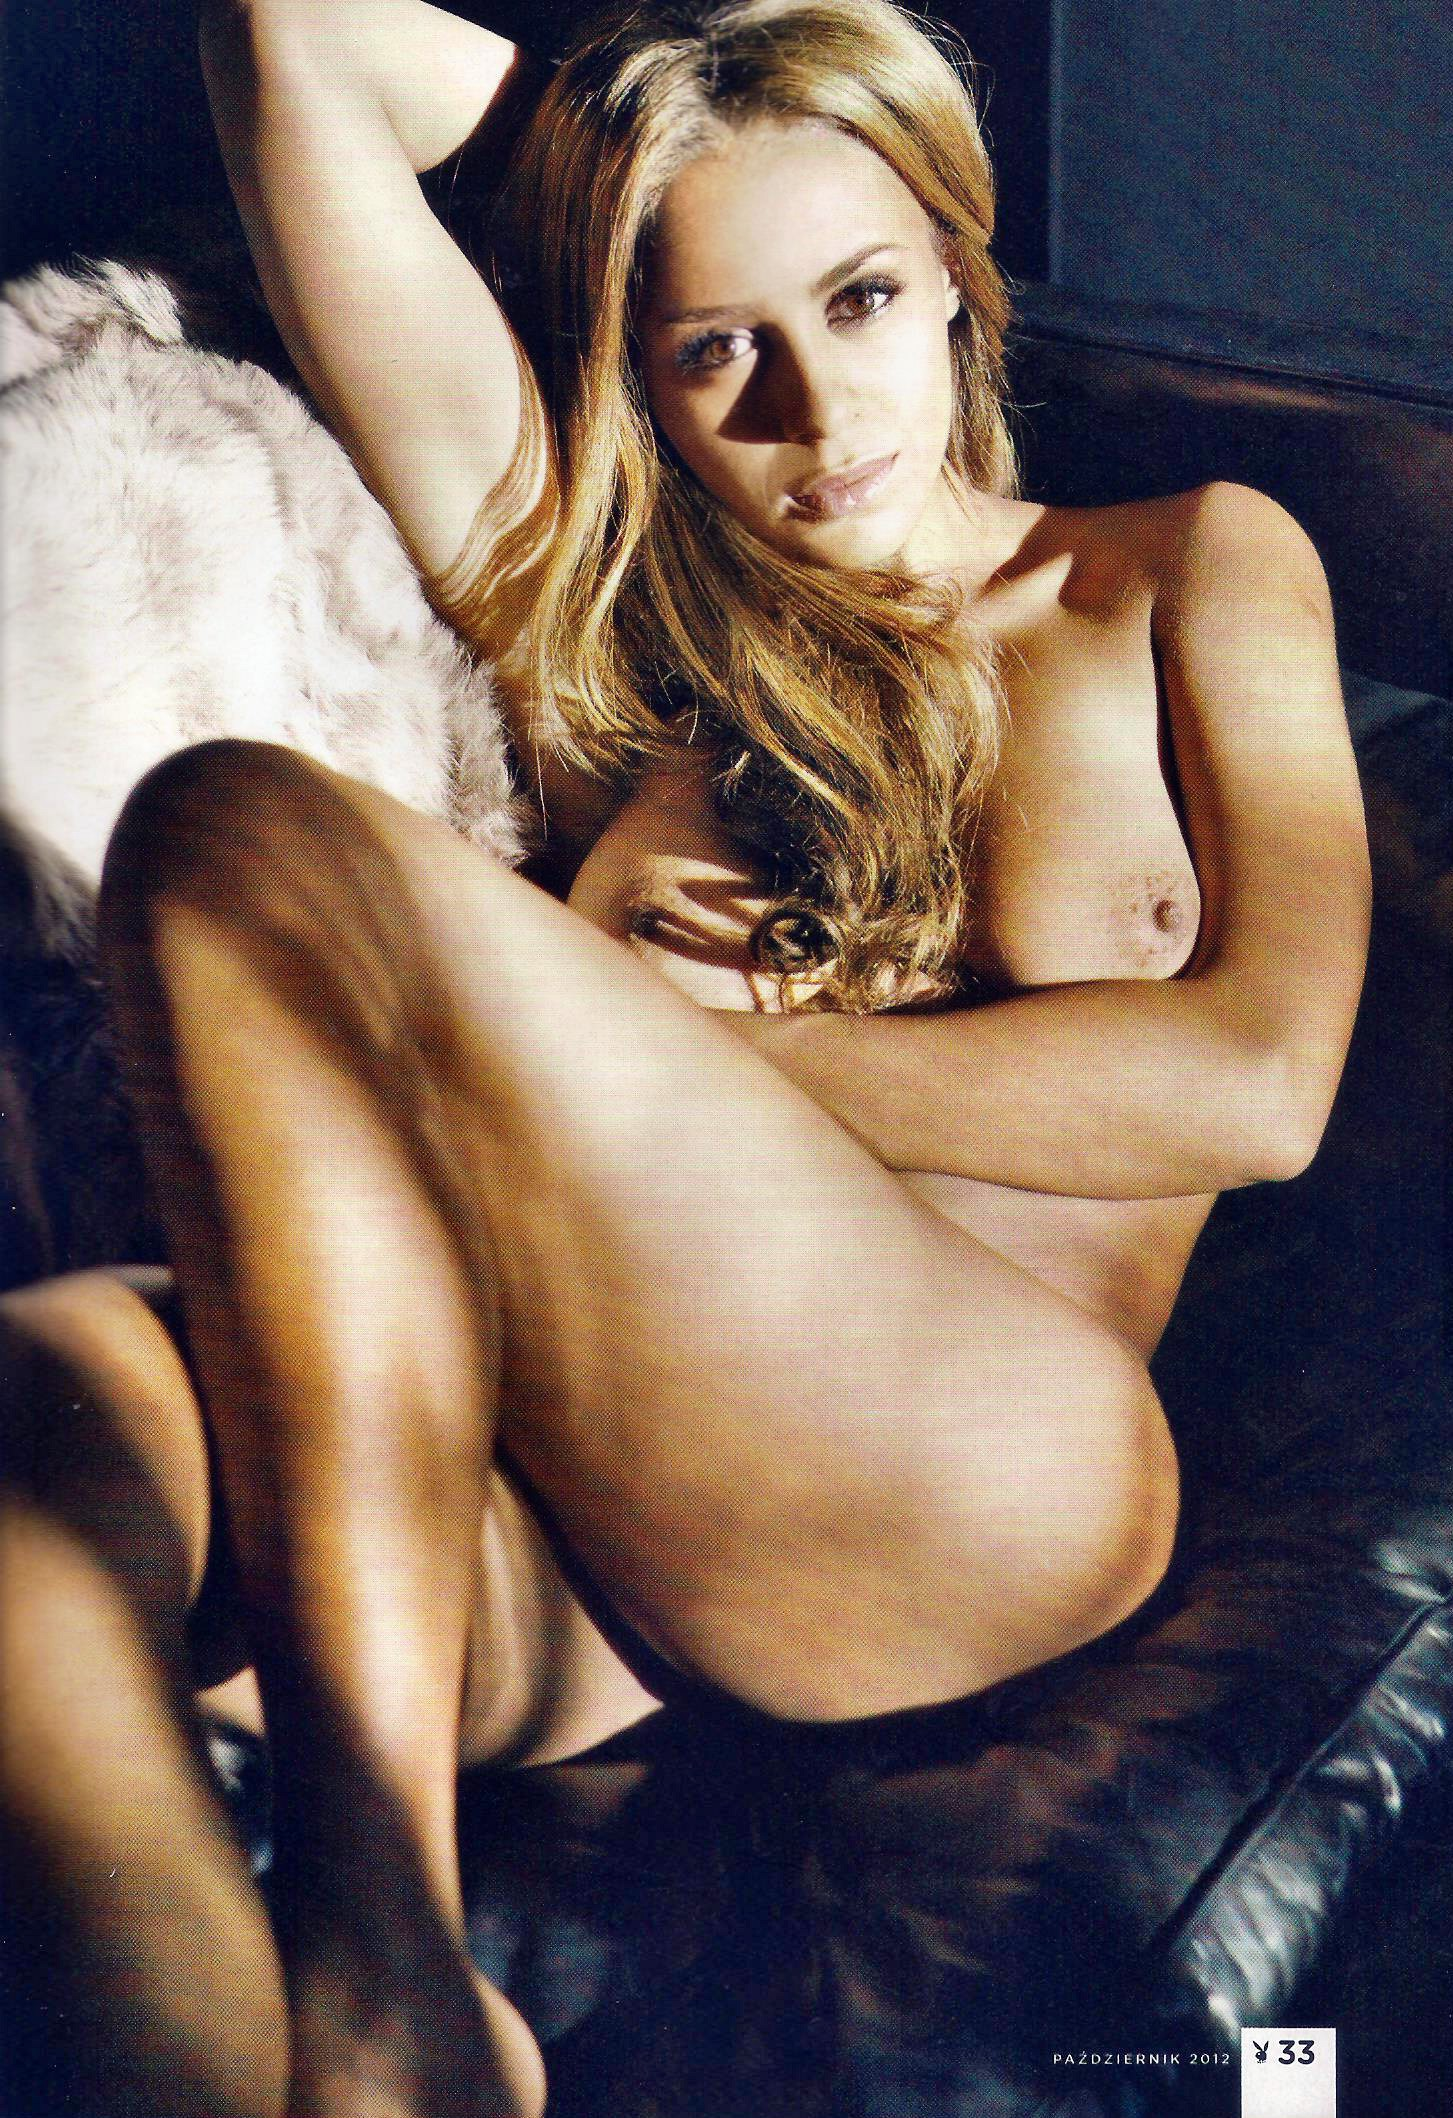 Aleksandra Szwed - Ola Szwed Nago